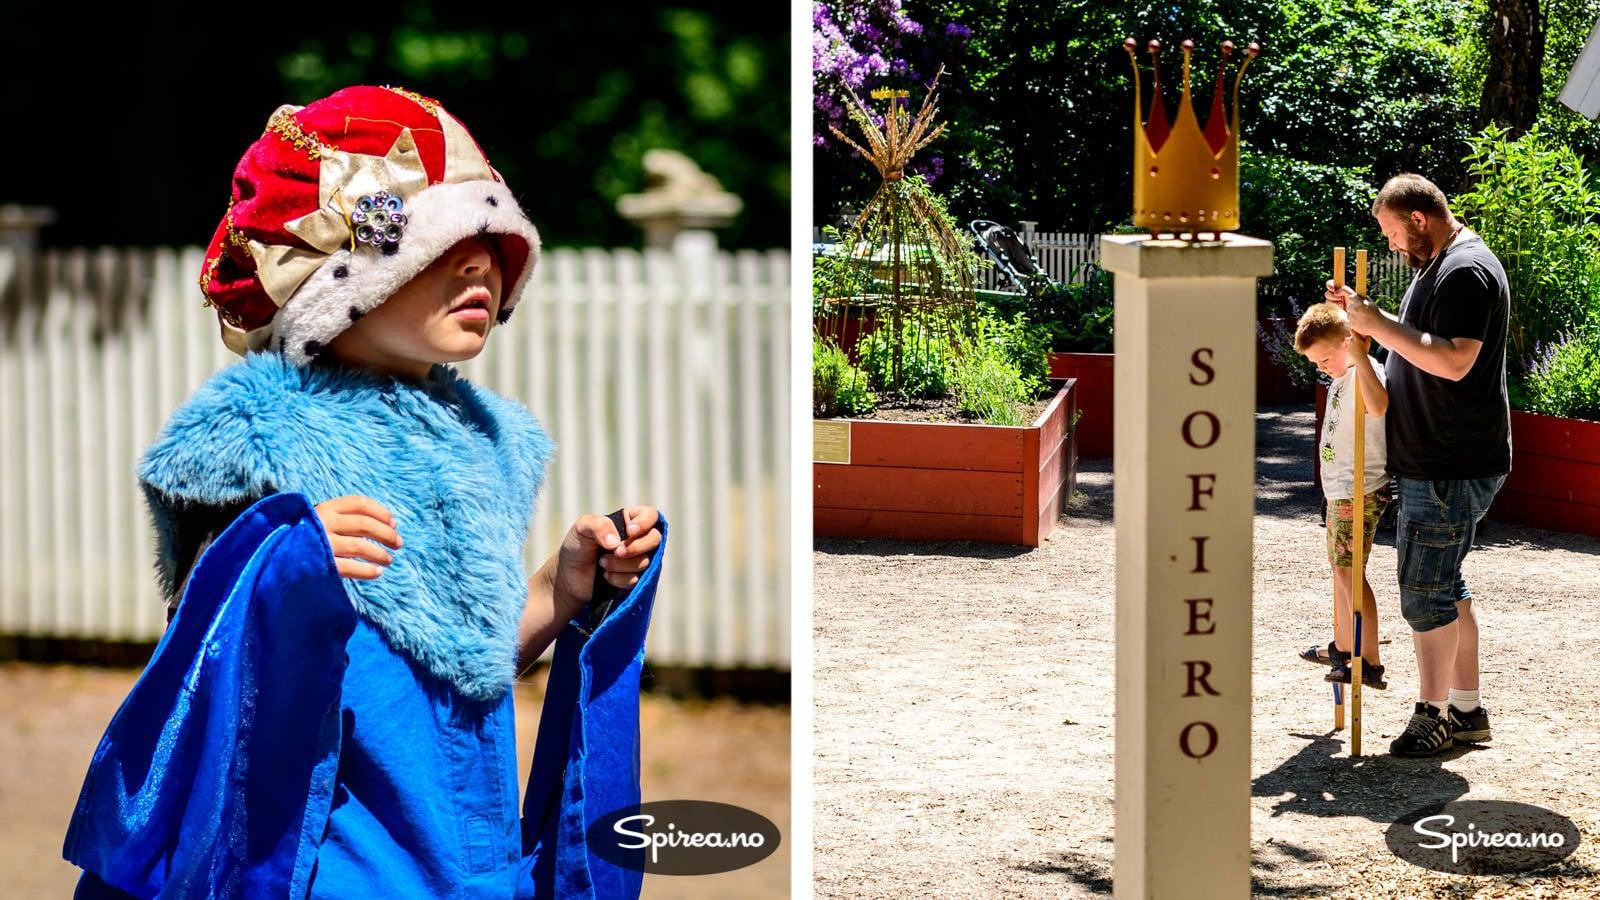 dronning og konge krone